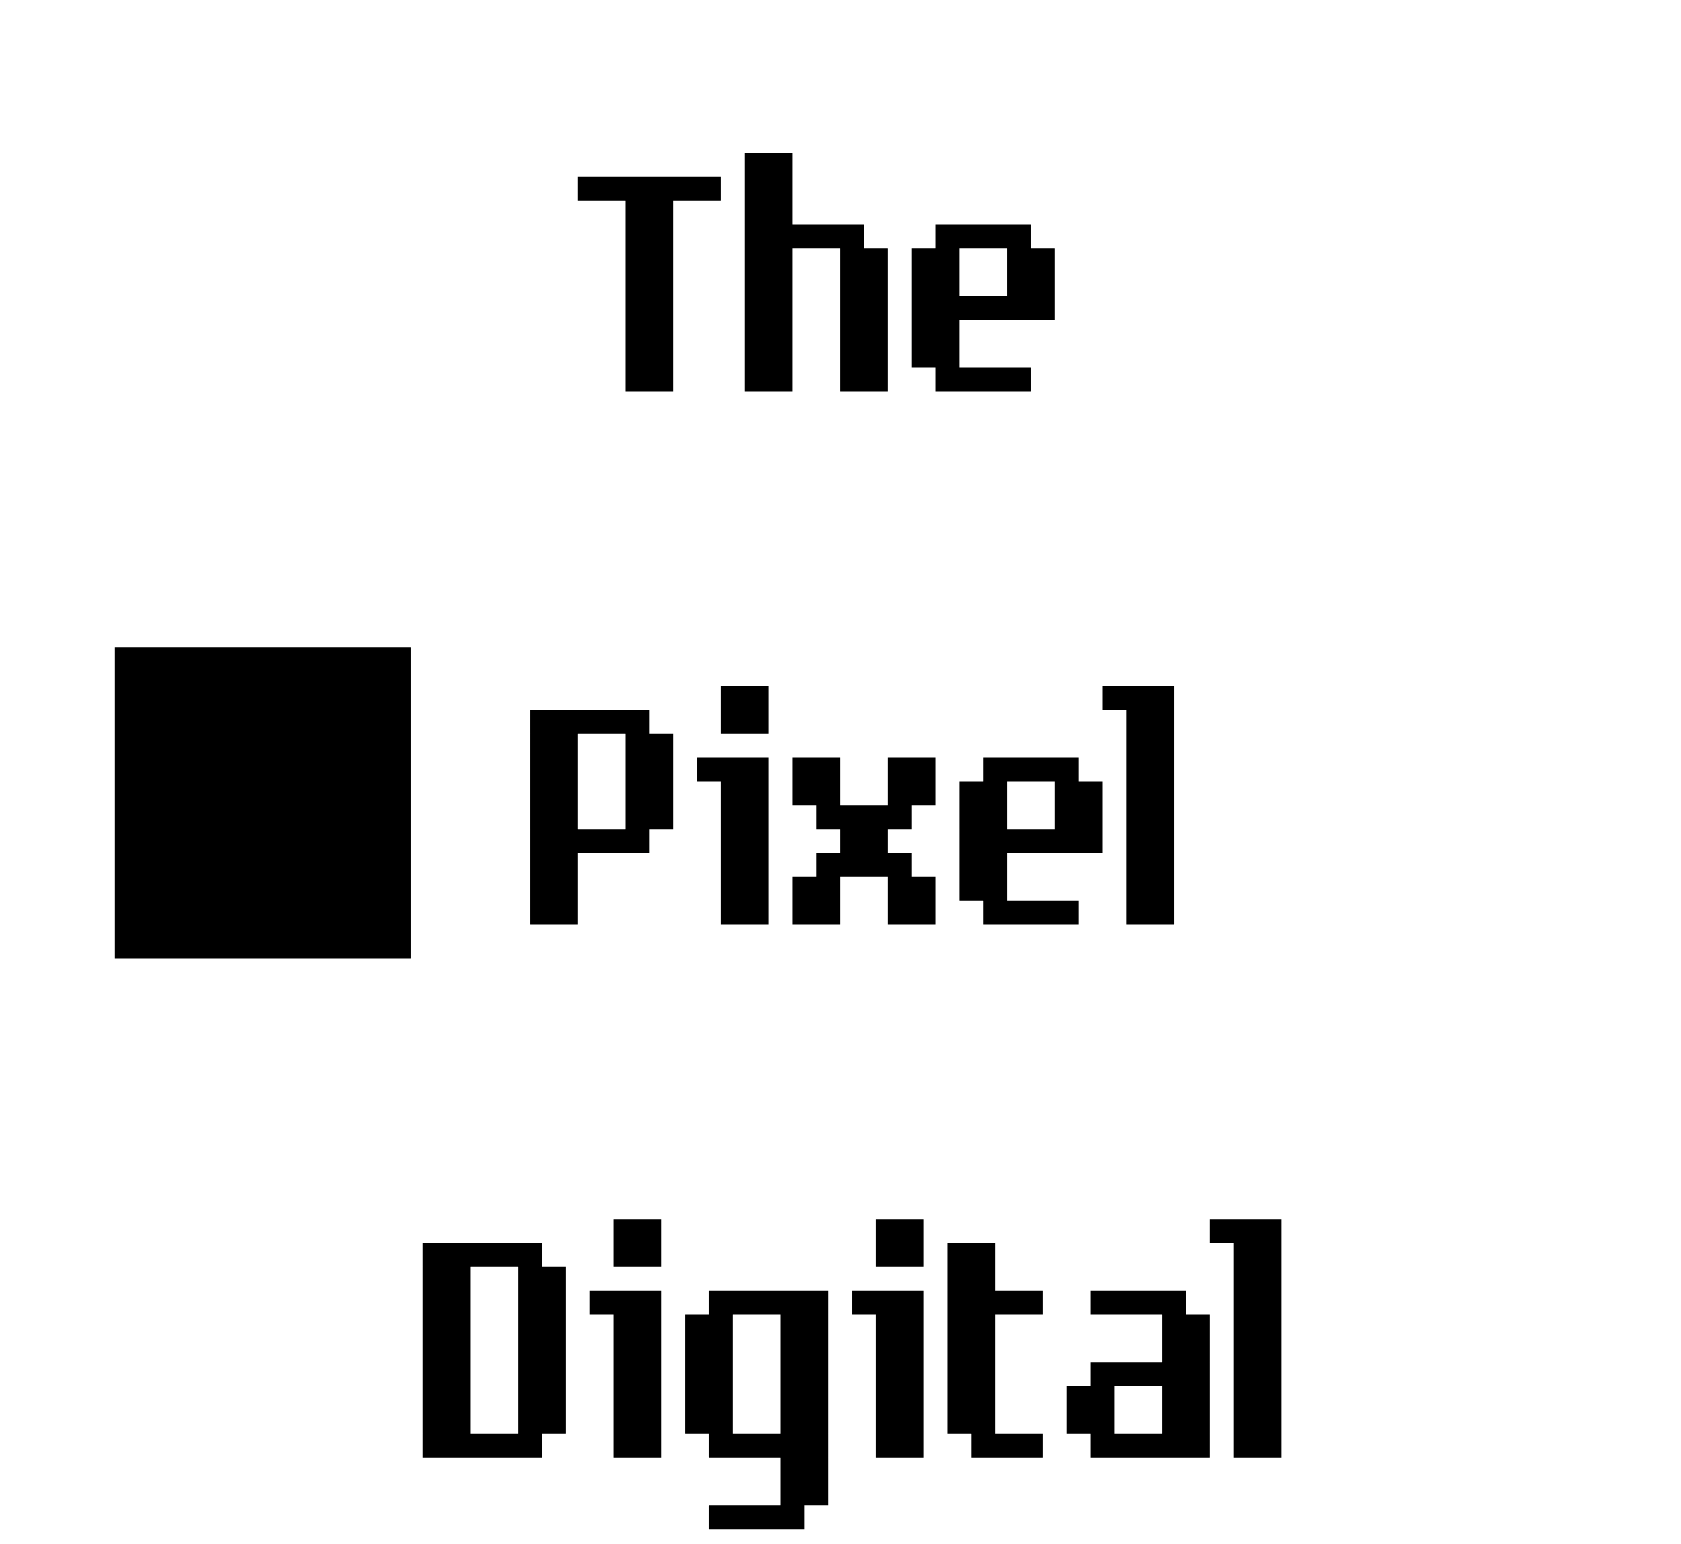 The Pixel Digital